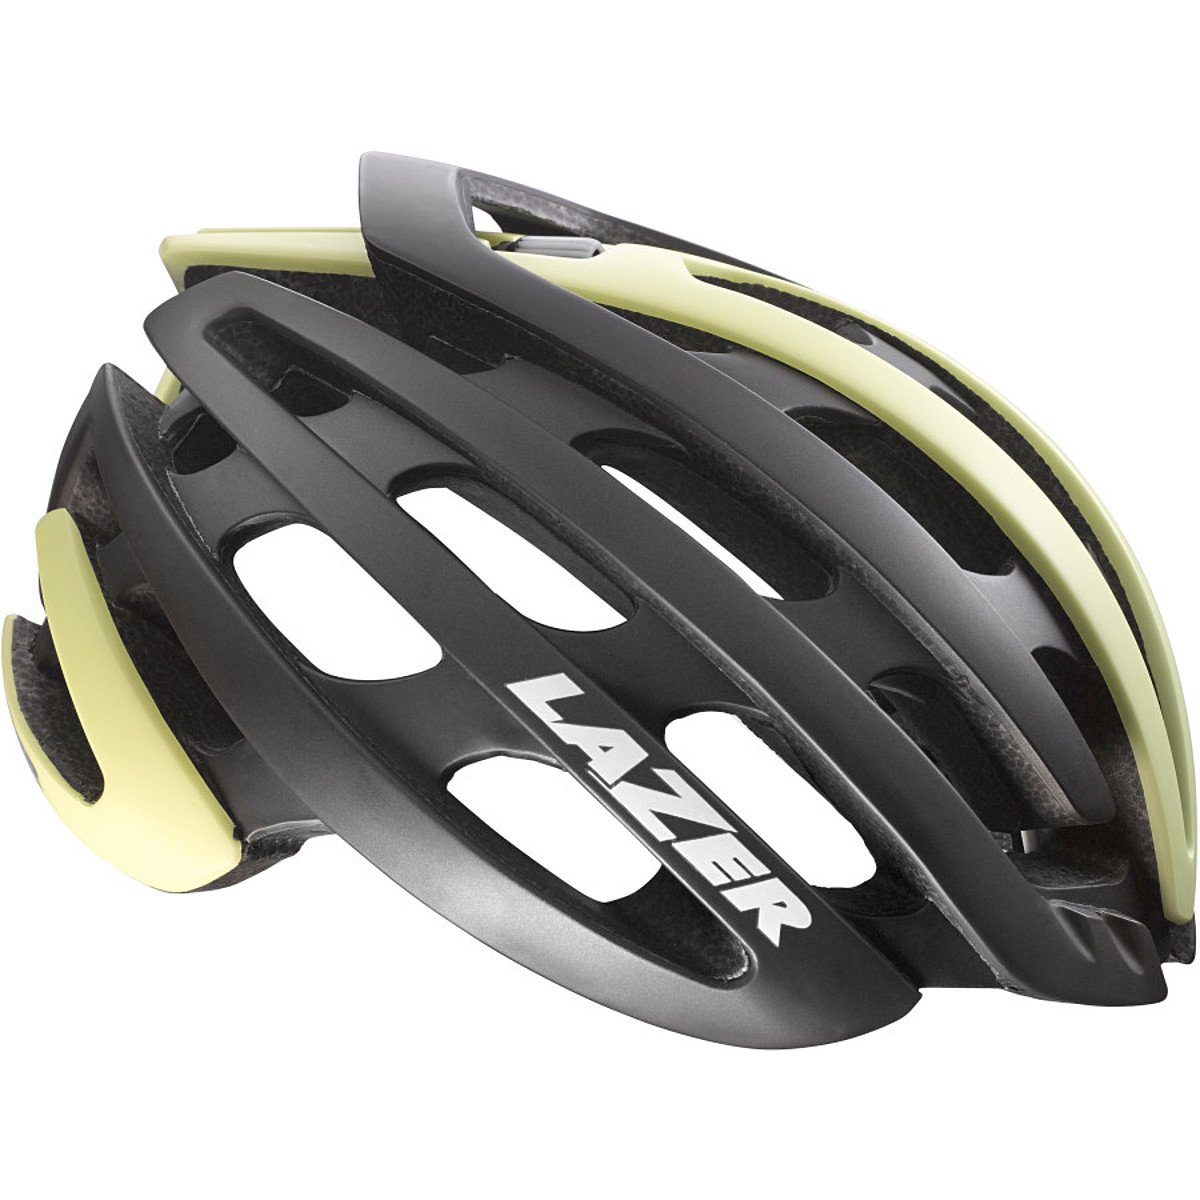 Lazer Z1 Helmet Vanilla Gray, S